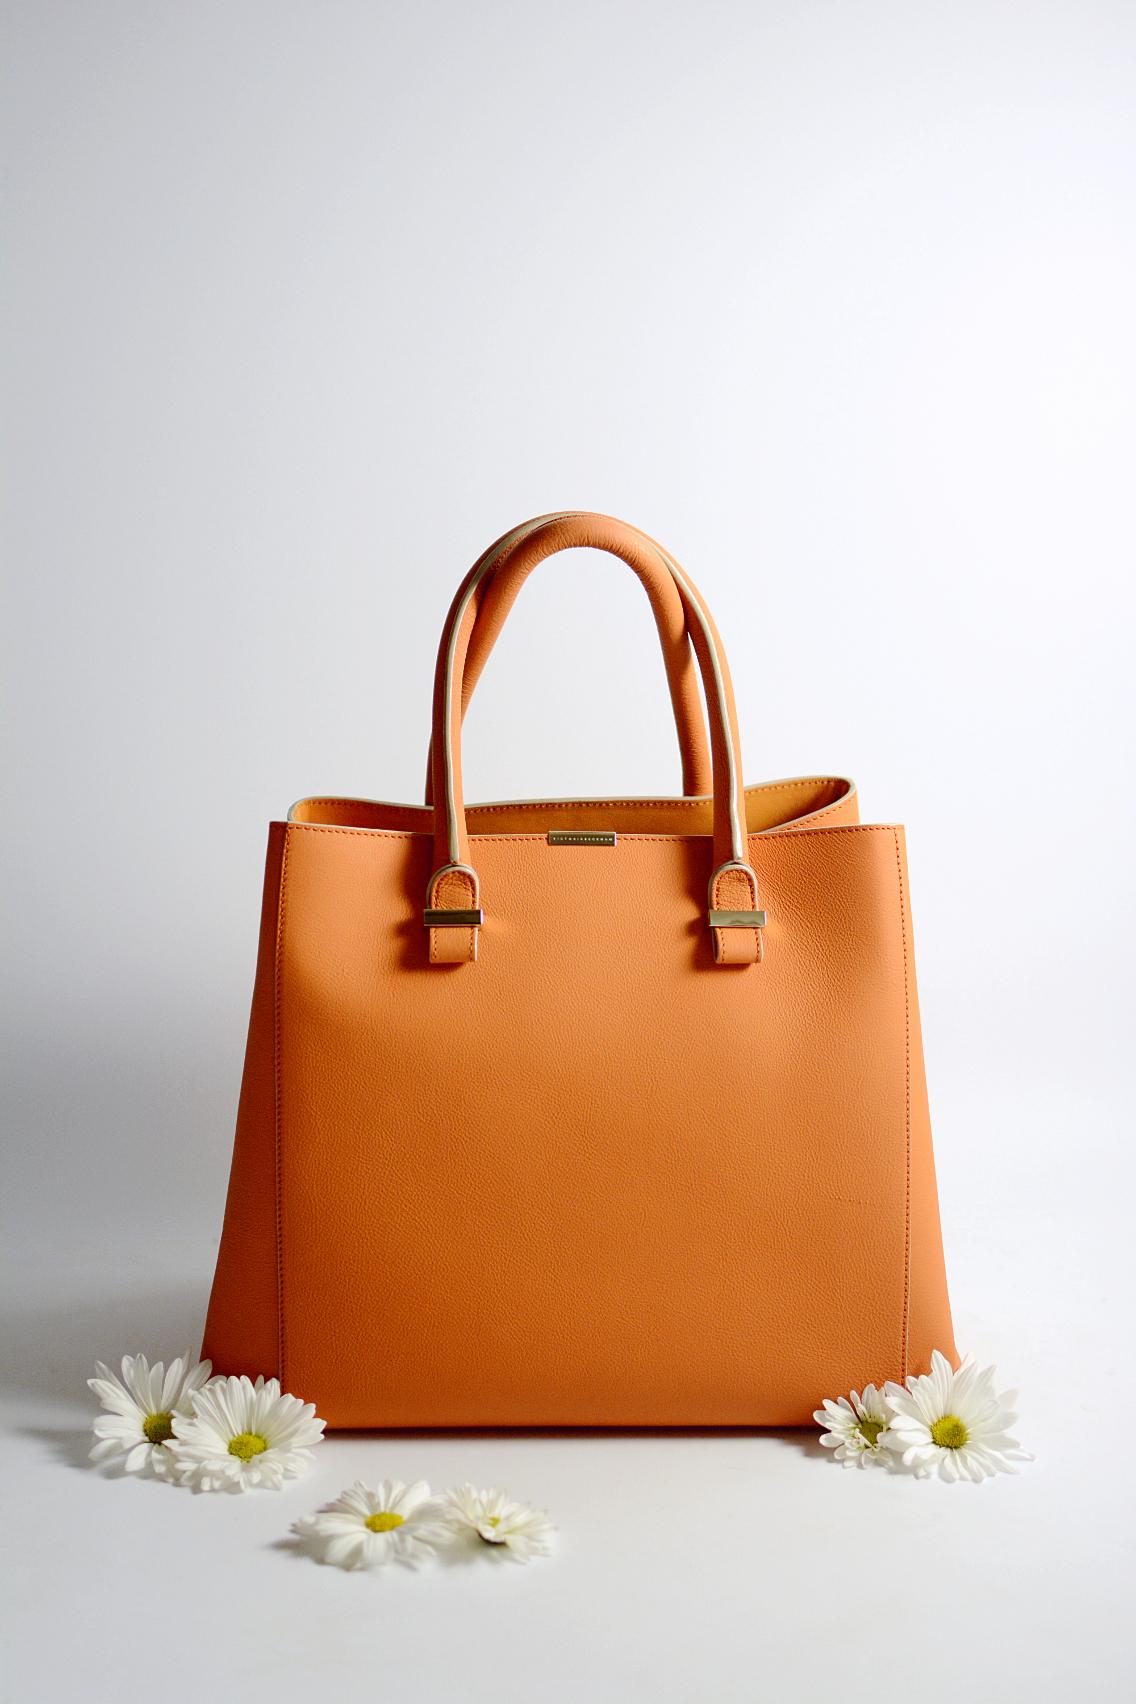 Victoria Beckham Liberty Tote Persimmon Orange 17